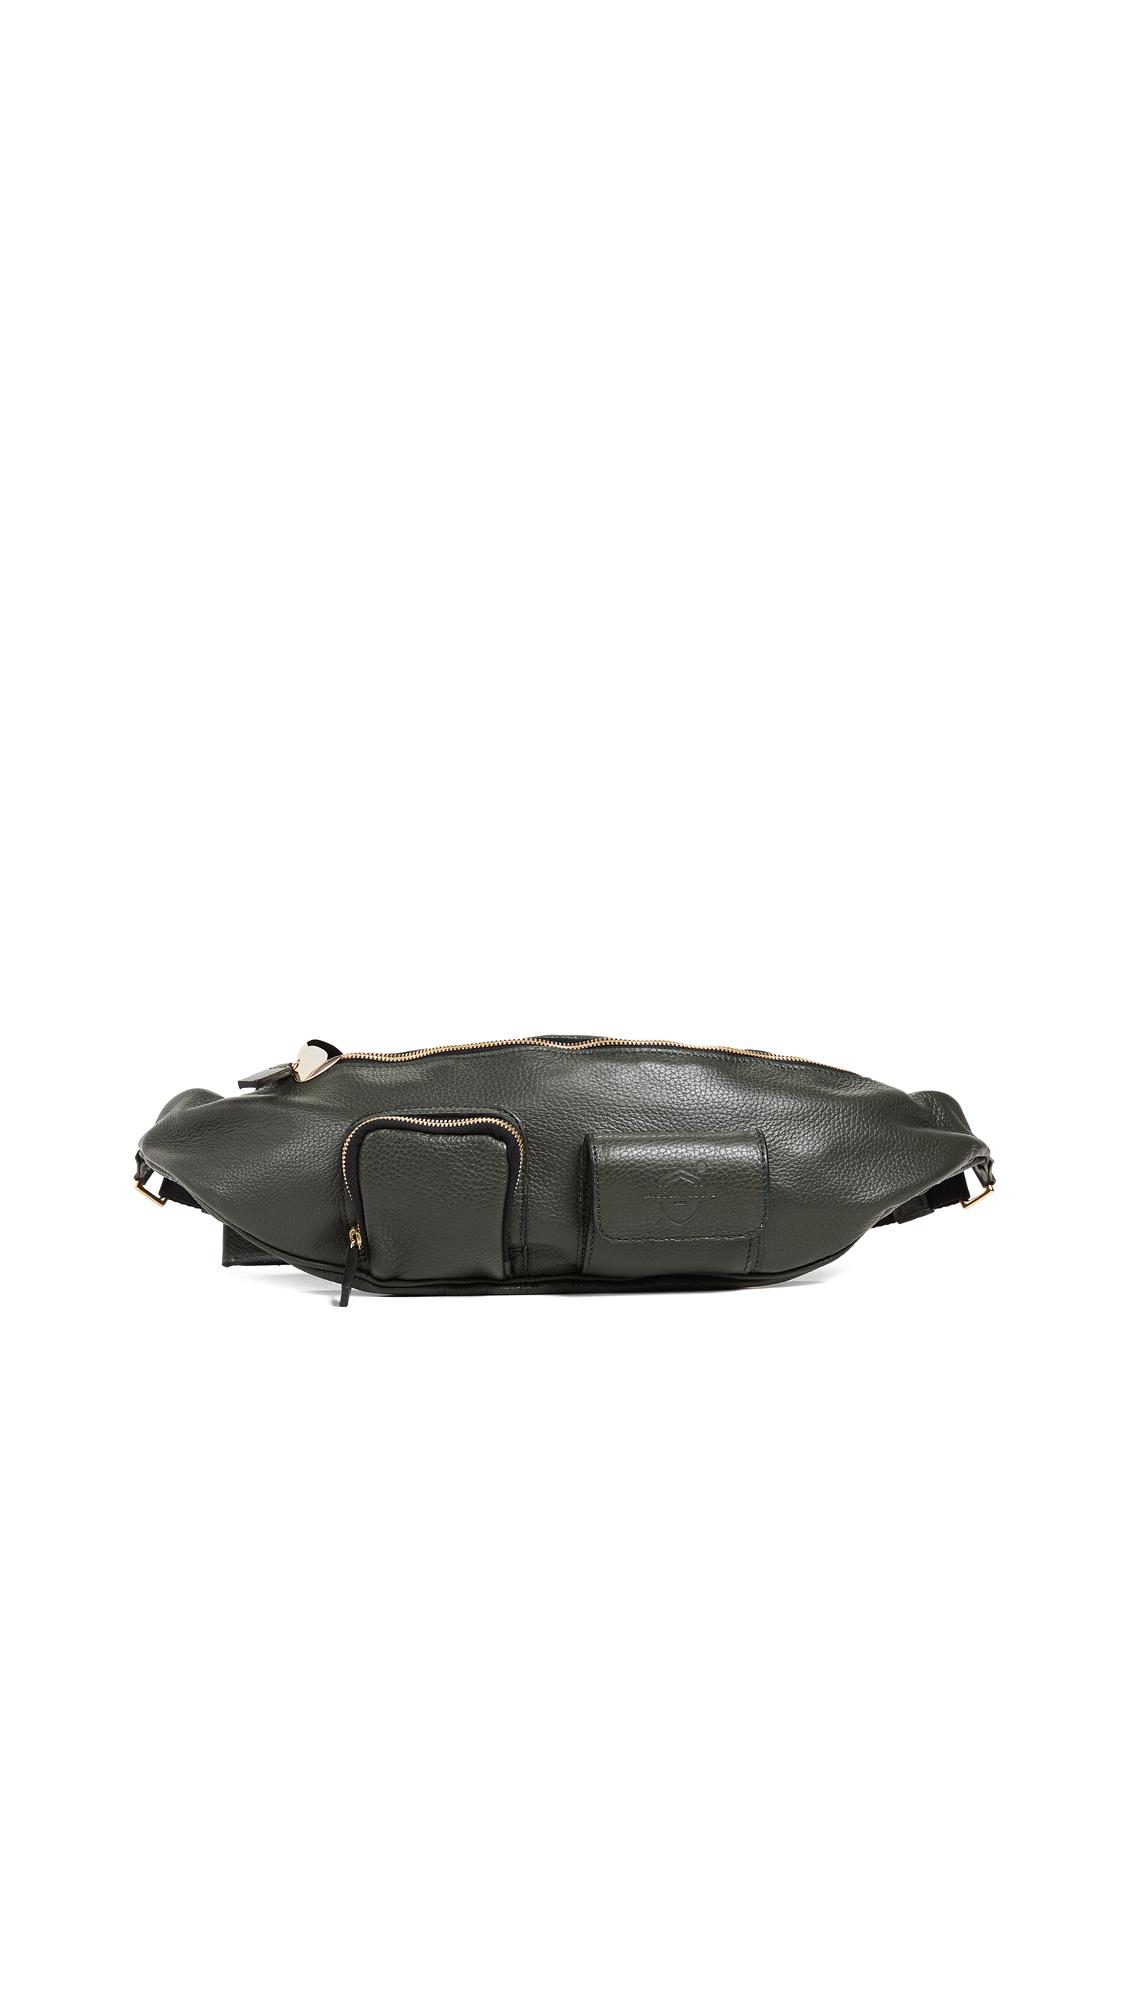 AVEC LA TROUPE Major Belt Bag in Military